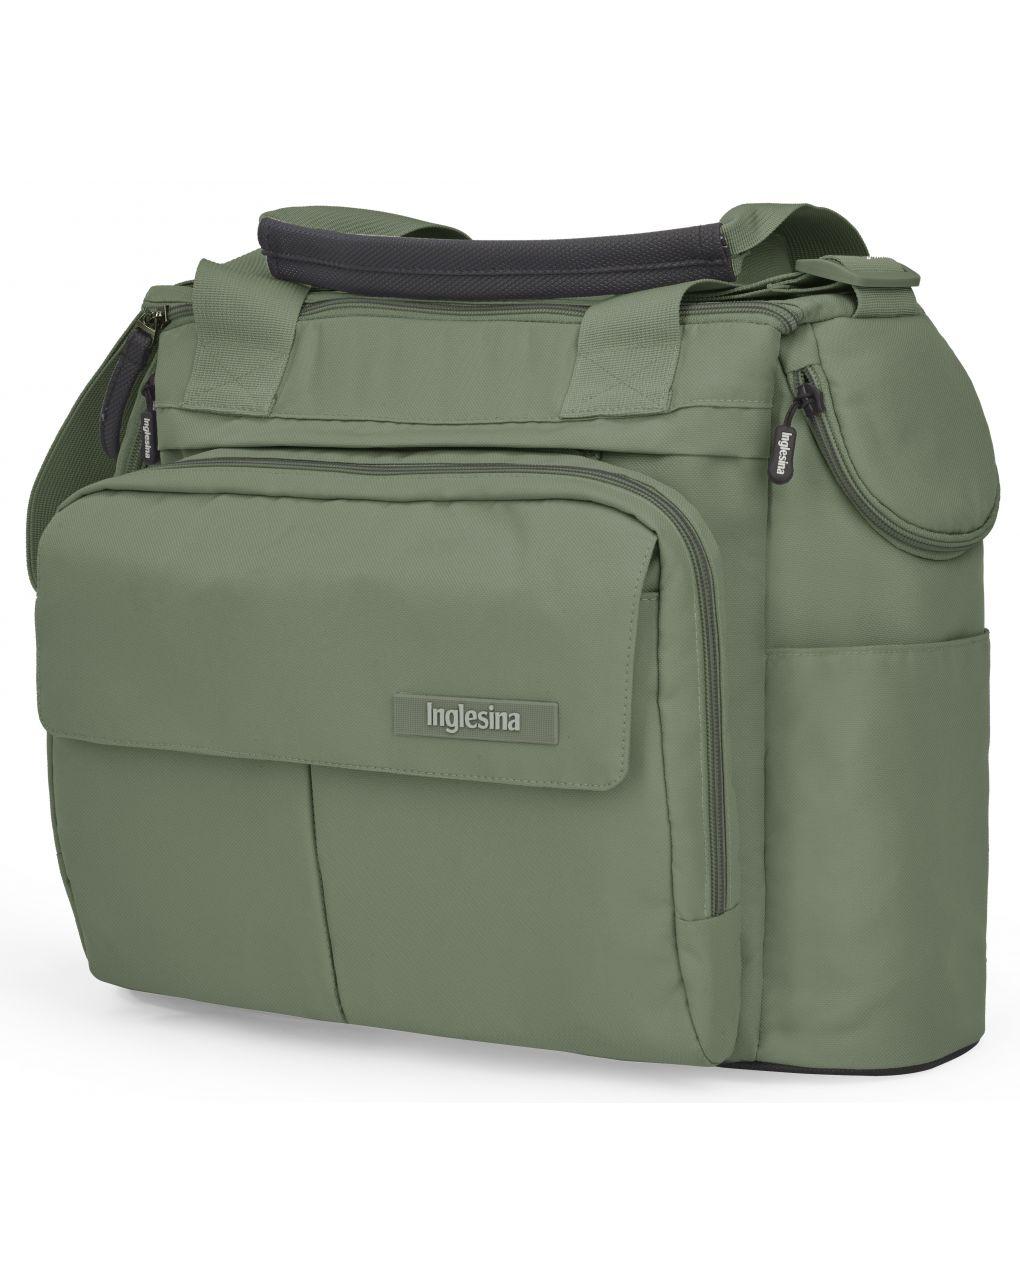 Inglesina Dual Bag Electa - Tribeca - Χακί